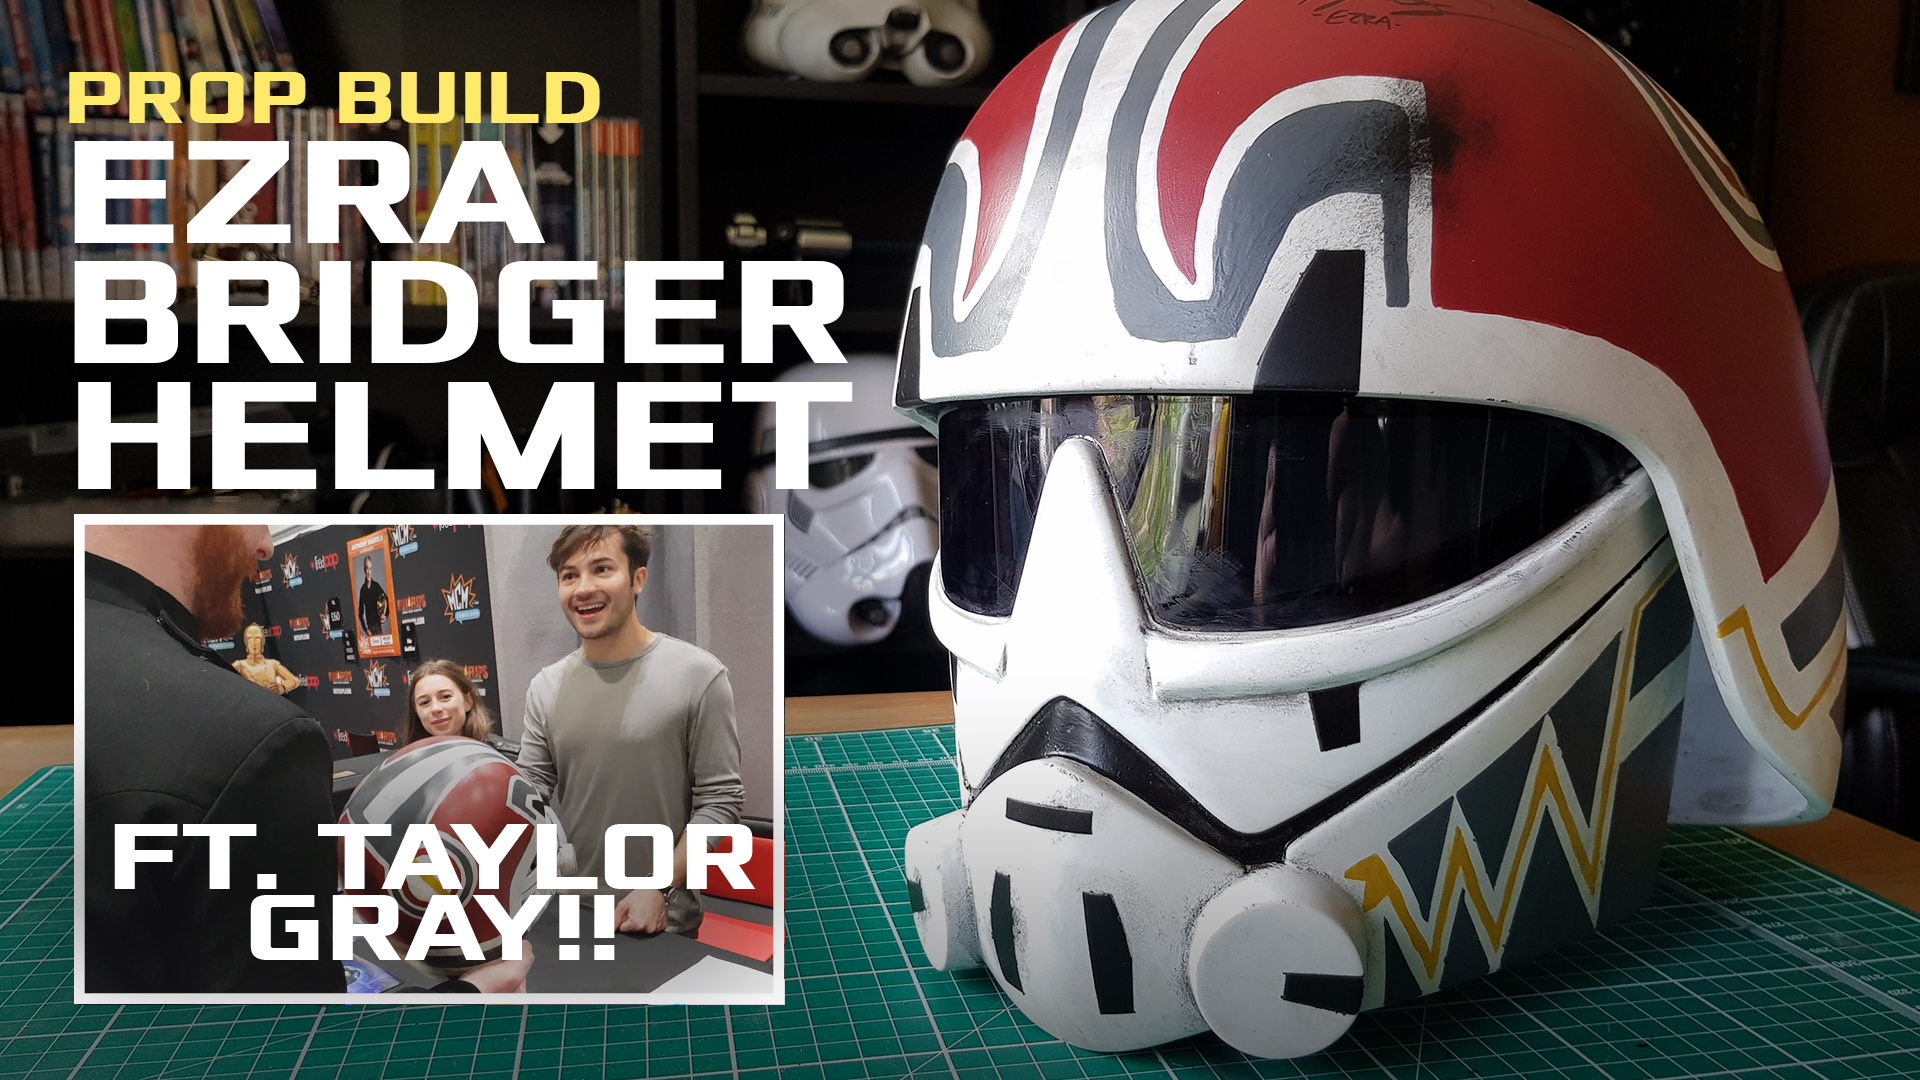 Ezra Bridger Helmet (ft. Ezra's Voi